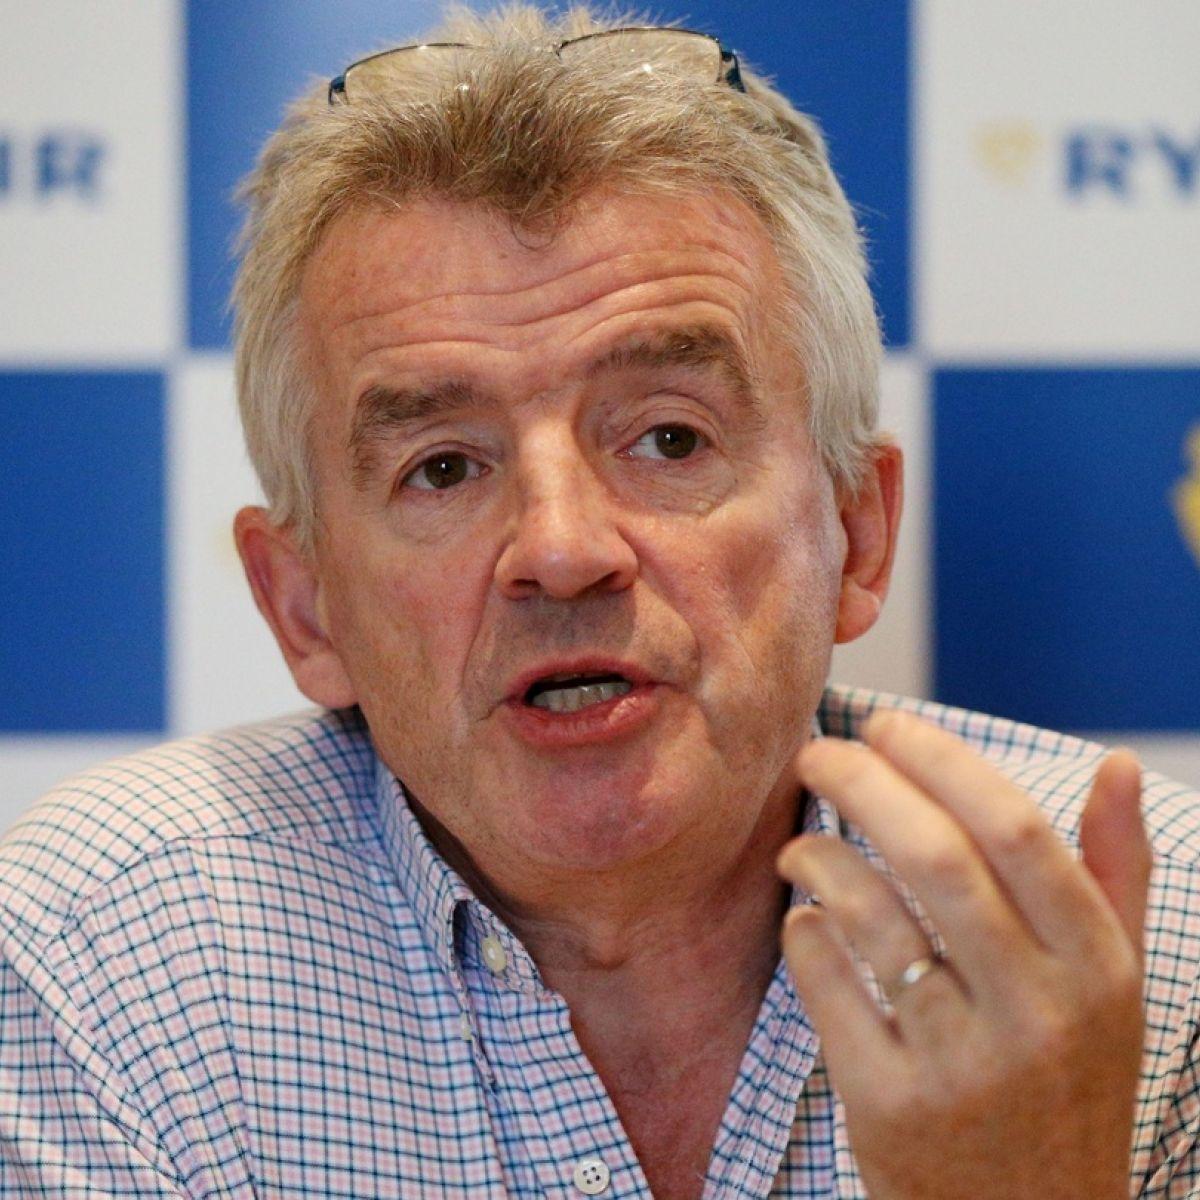 Ryanair CEO Contests Alitalia 3 Billion Euro Funding